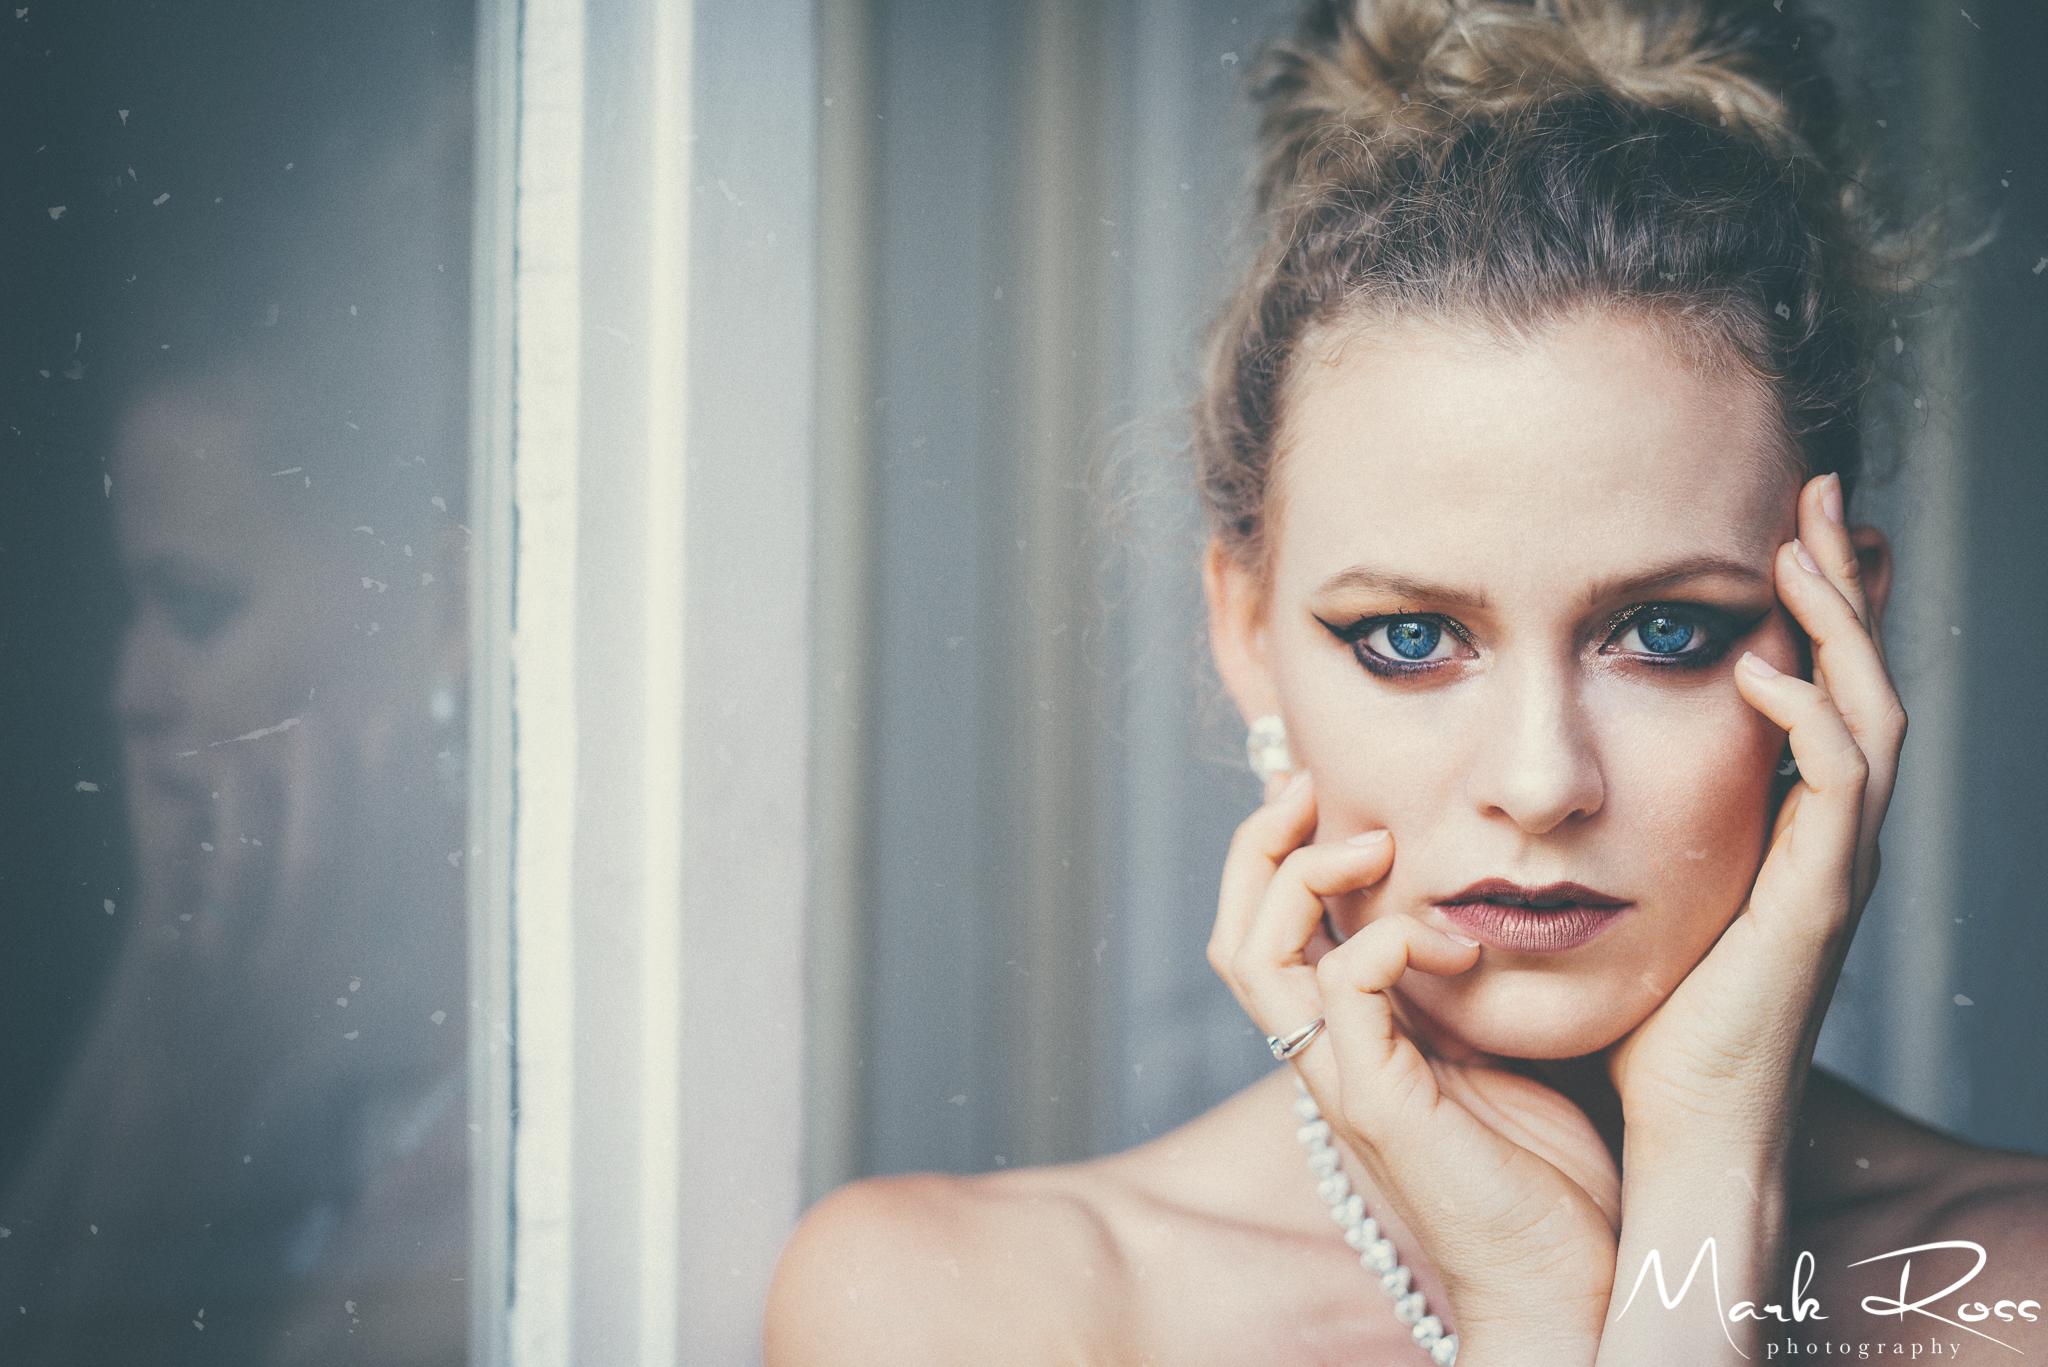 Denver-Portrait-Photographer-Mark-Ross-Photography-Maggie-Paris-2018-Feather-Ballgown-Web-Resolution-Watermarked-6.jpg